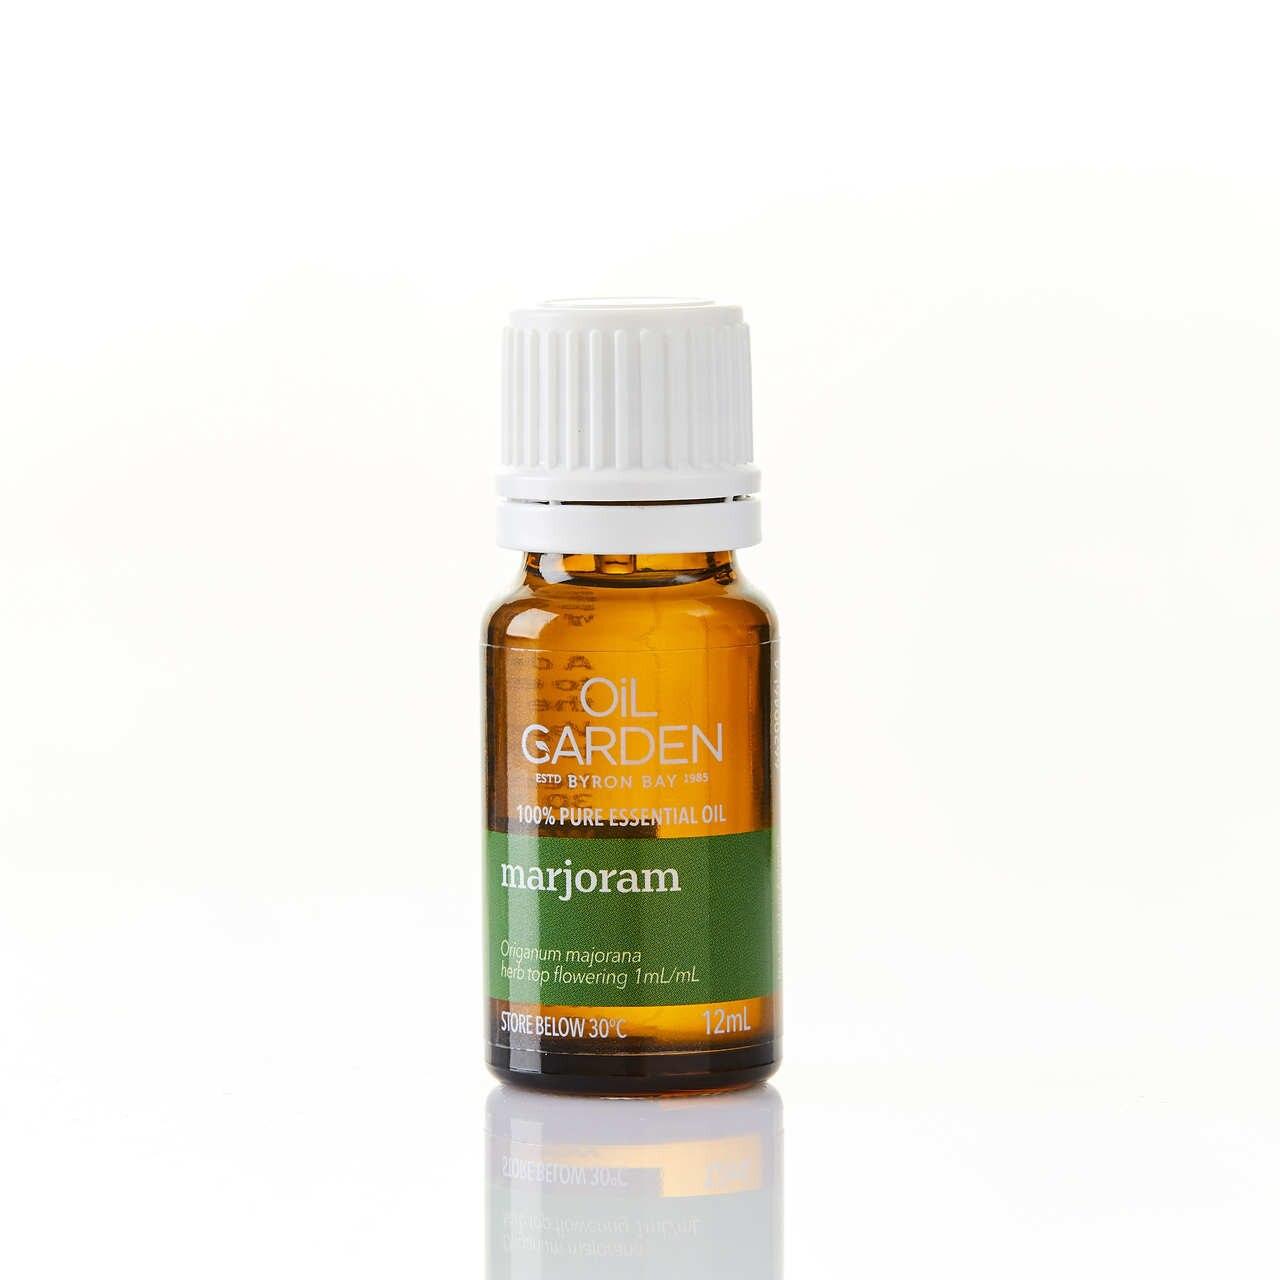 Oil Garden Marjoram Pure Essential Oil 12mL 6620046